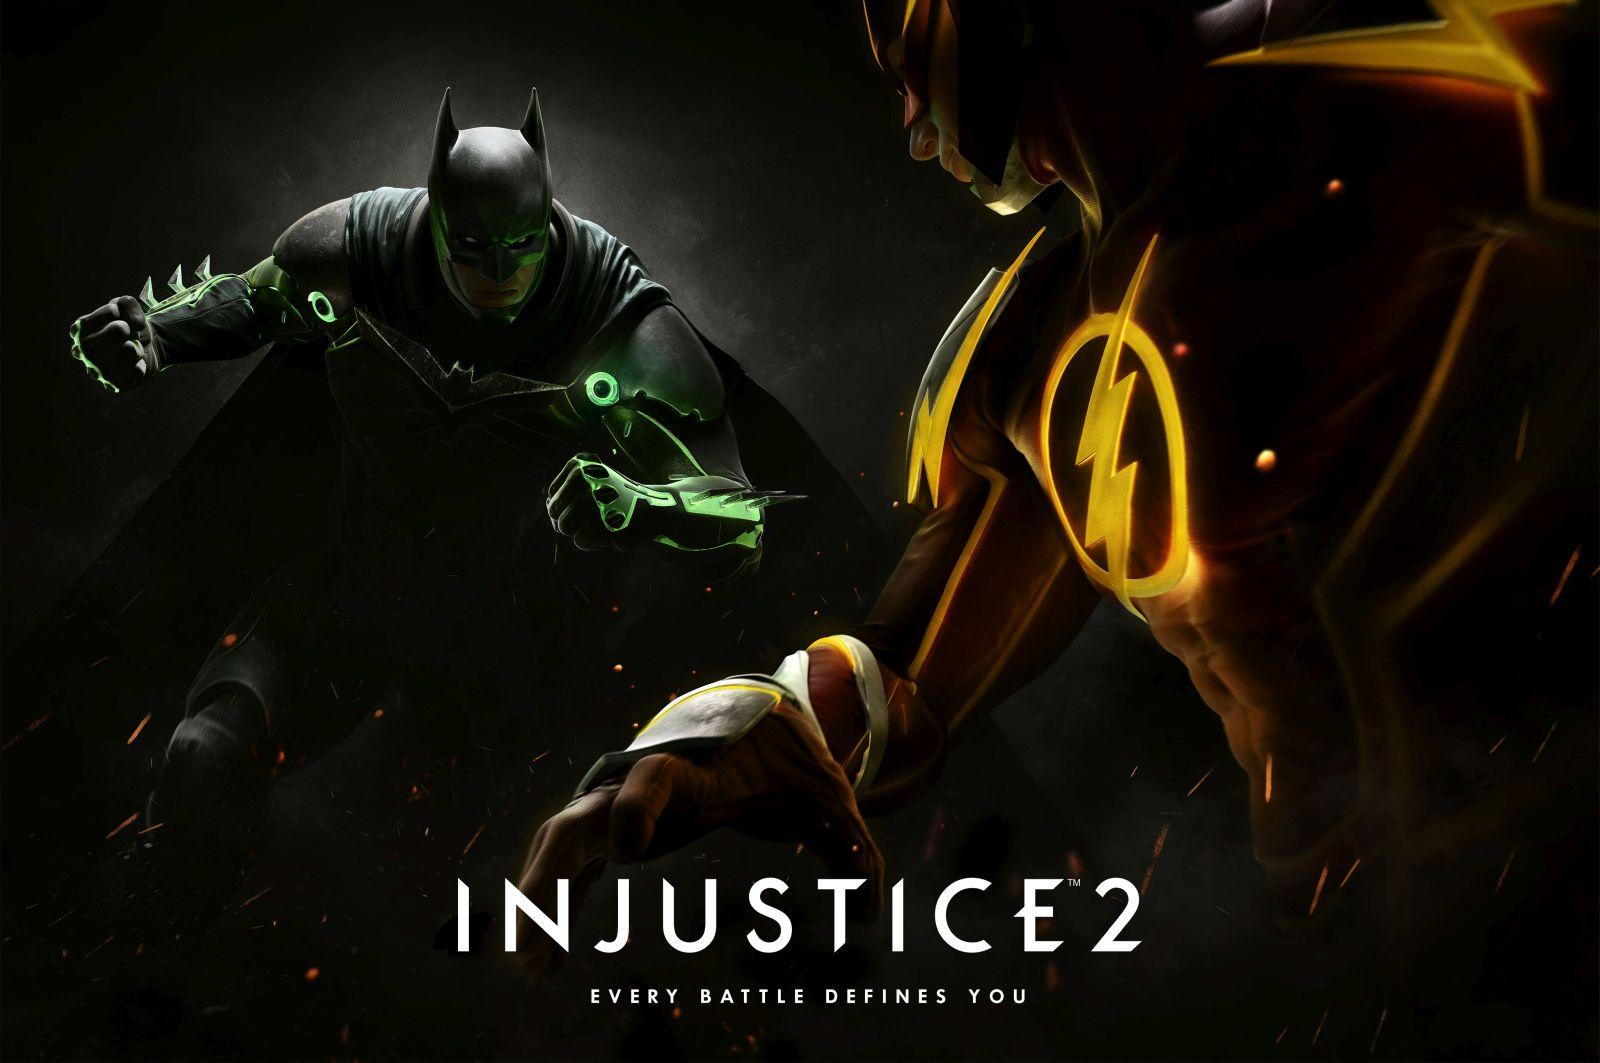 injustice 2 e3 gameplay